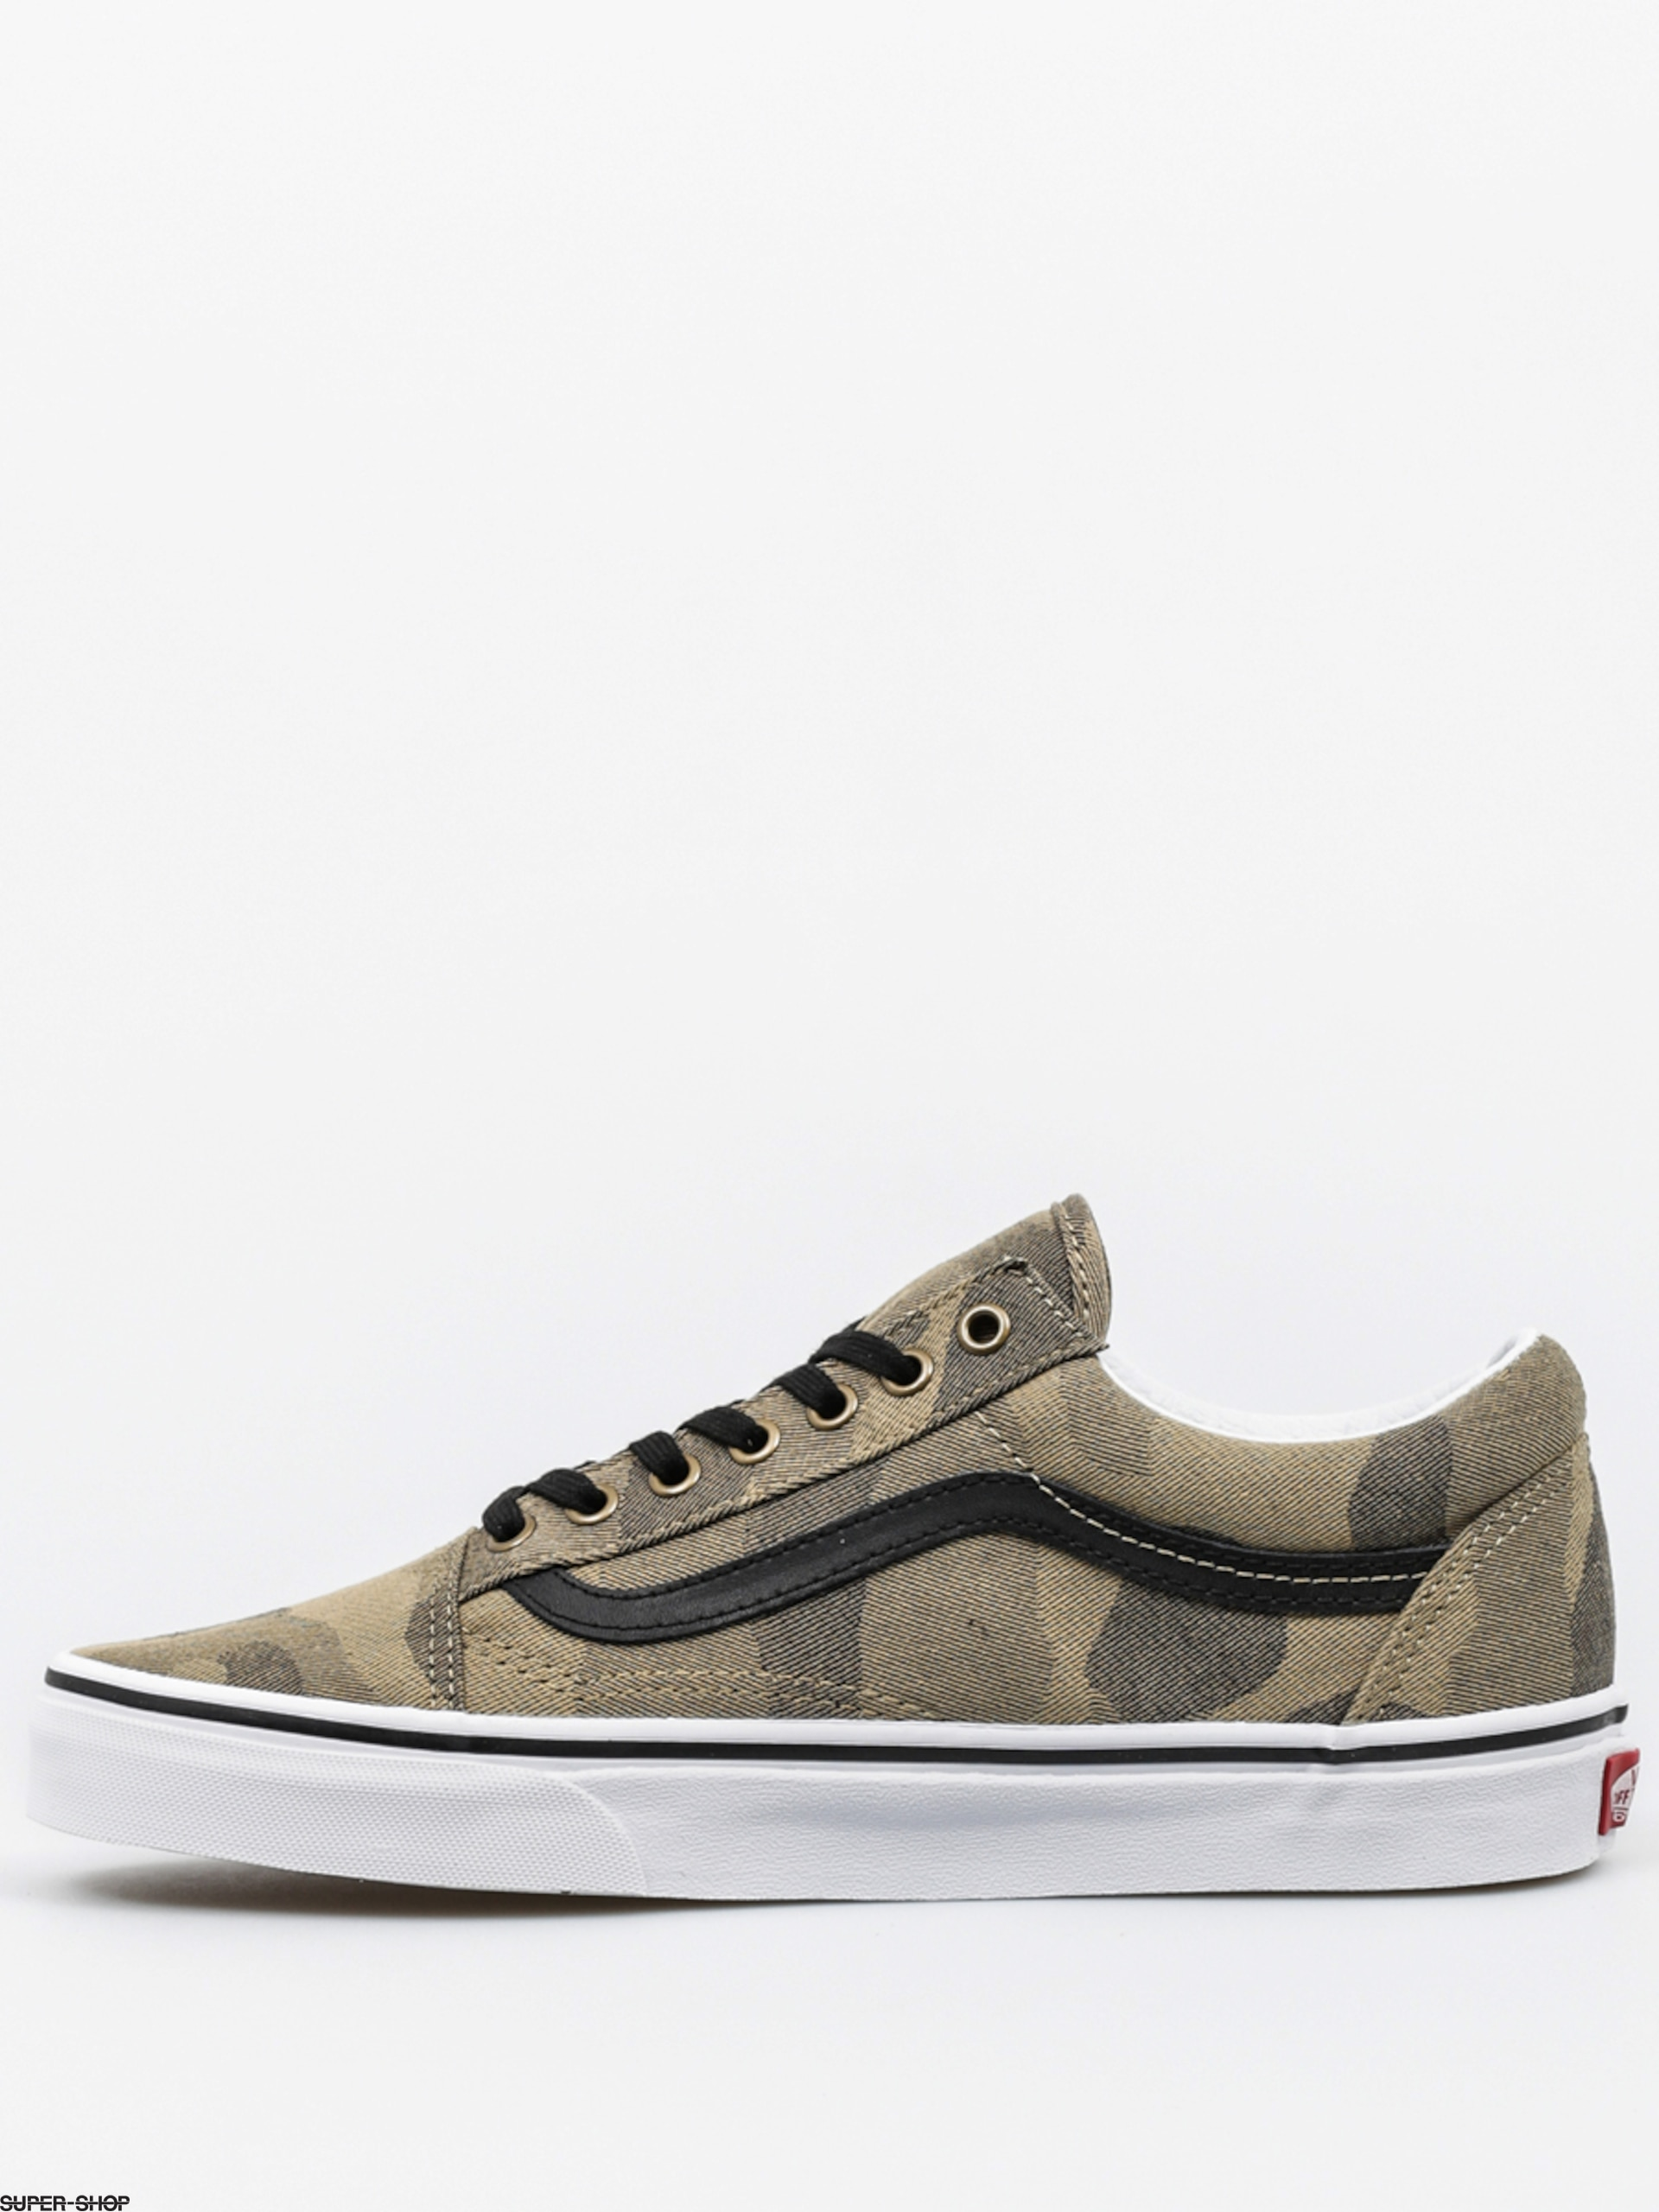 52ae418dc7147a Vans Shoes Old Skool (camo jacquard raven true white)